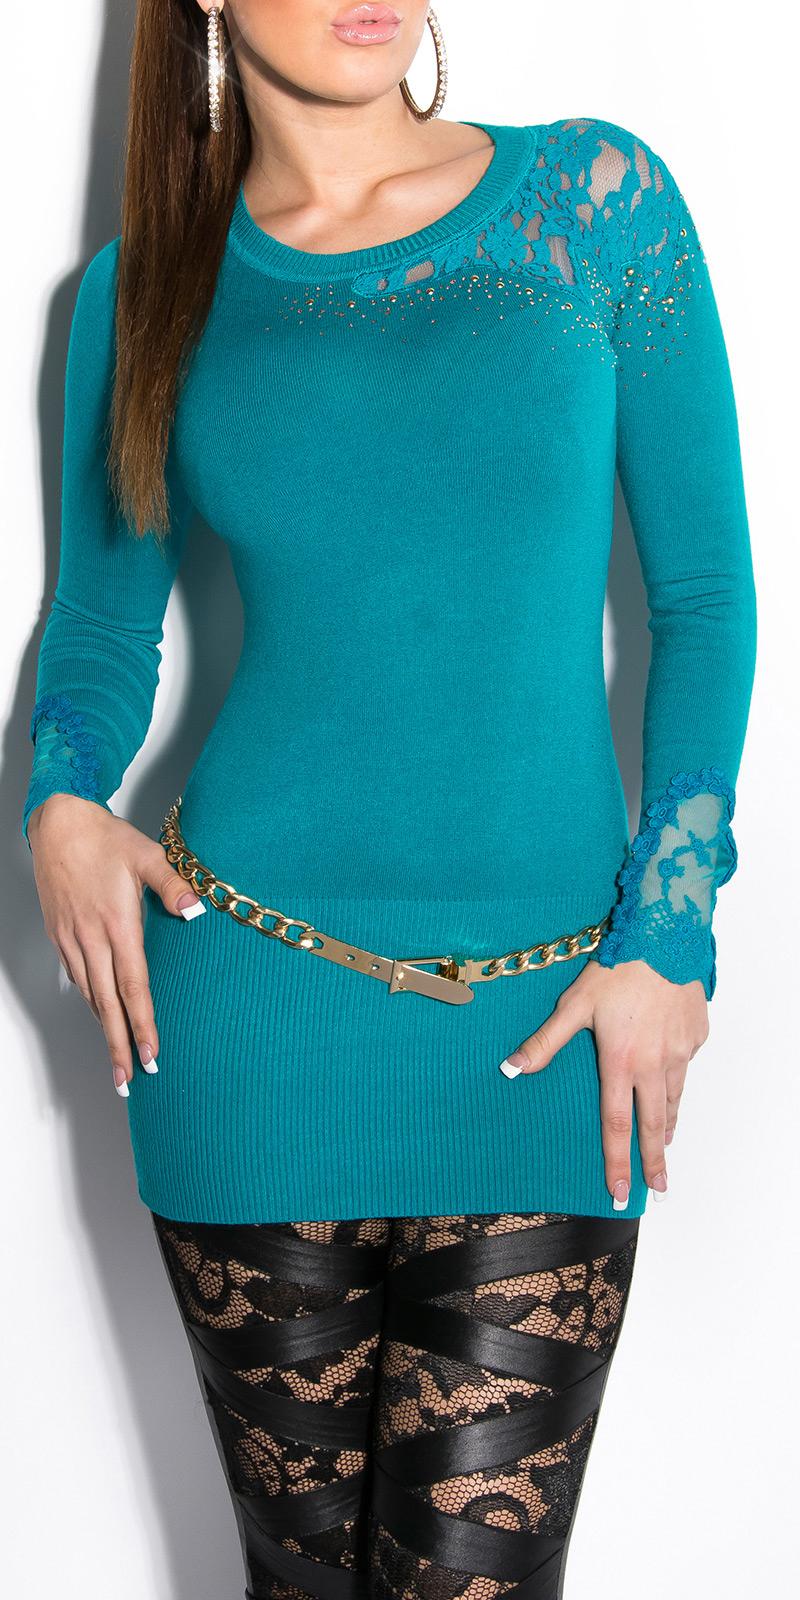 Dámský dlouhý svetr s krajkou a kamínky Koucla safír (Dámský svetr)